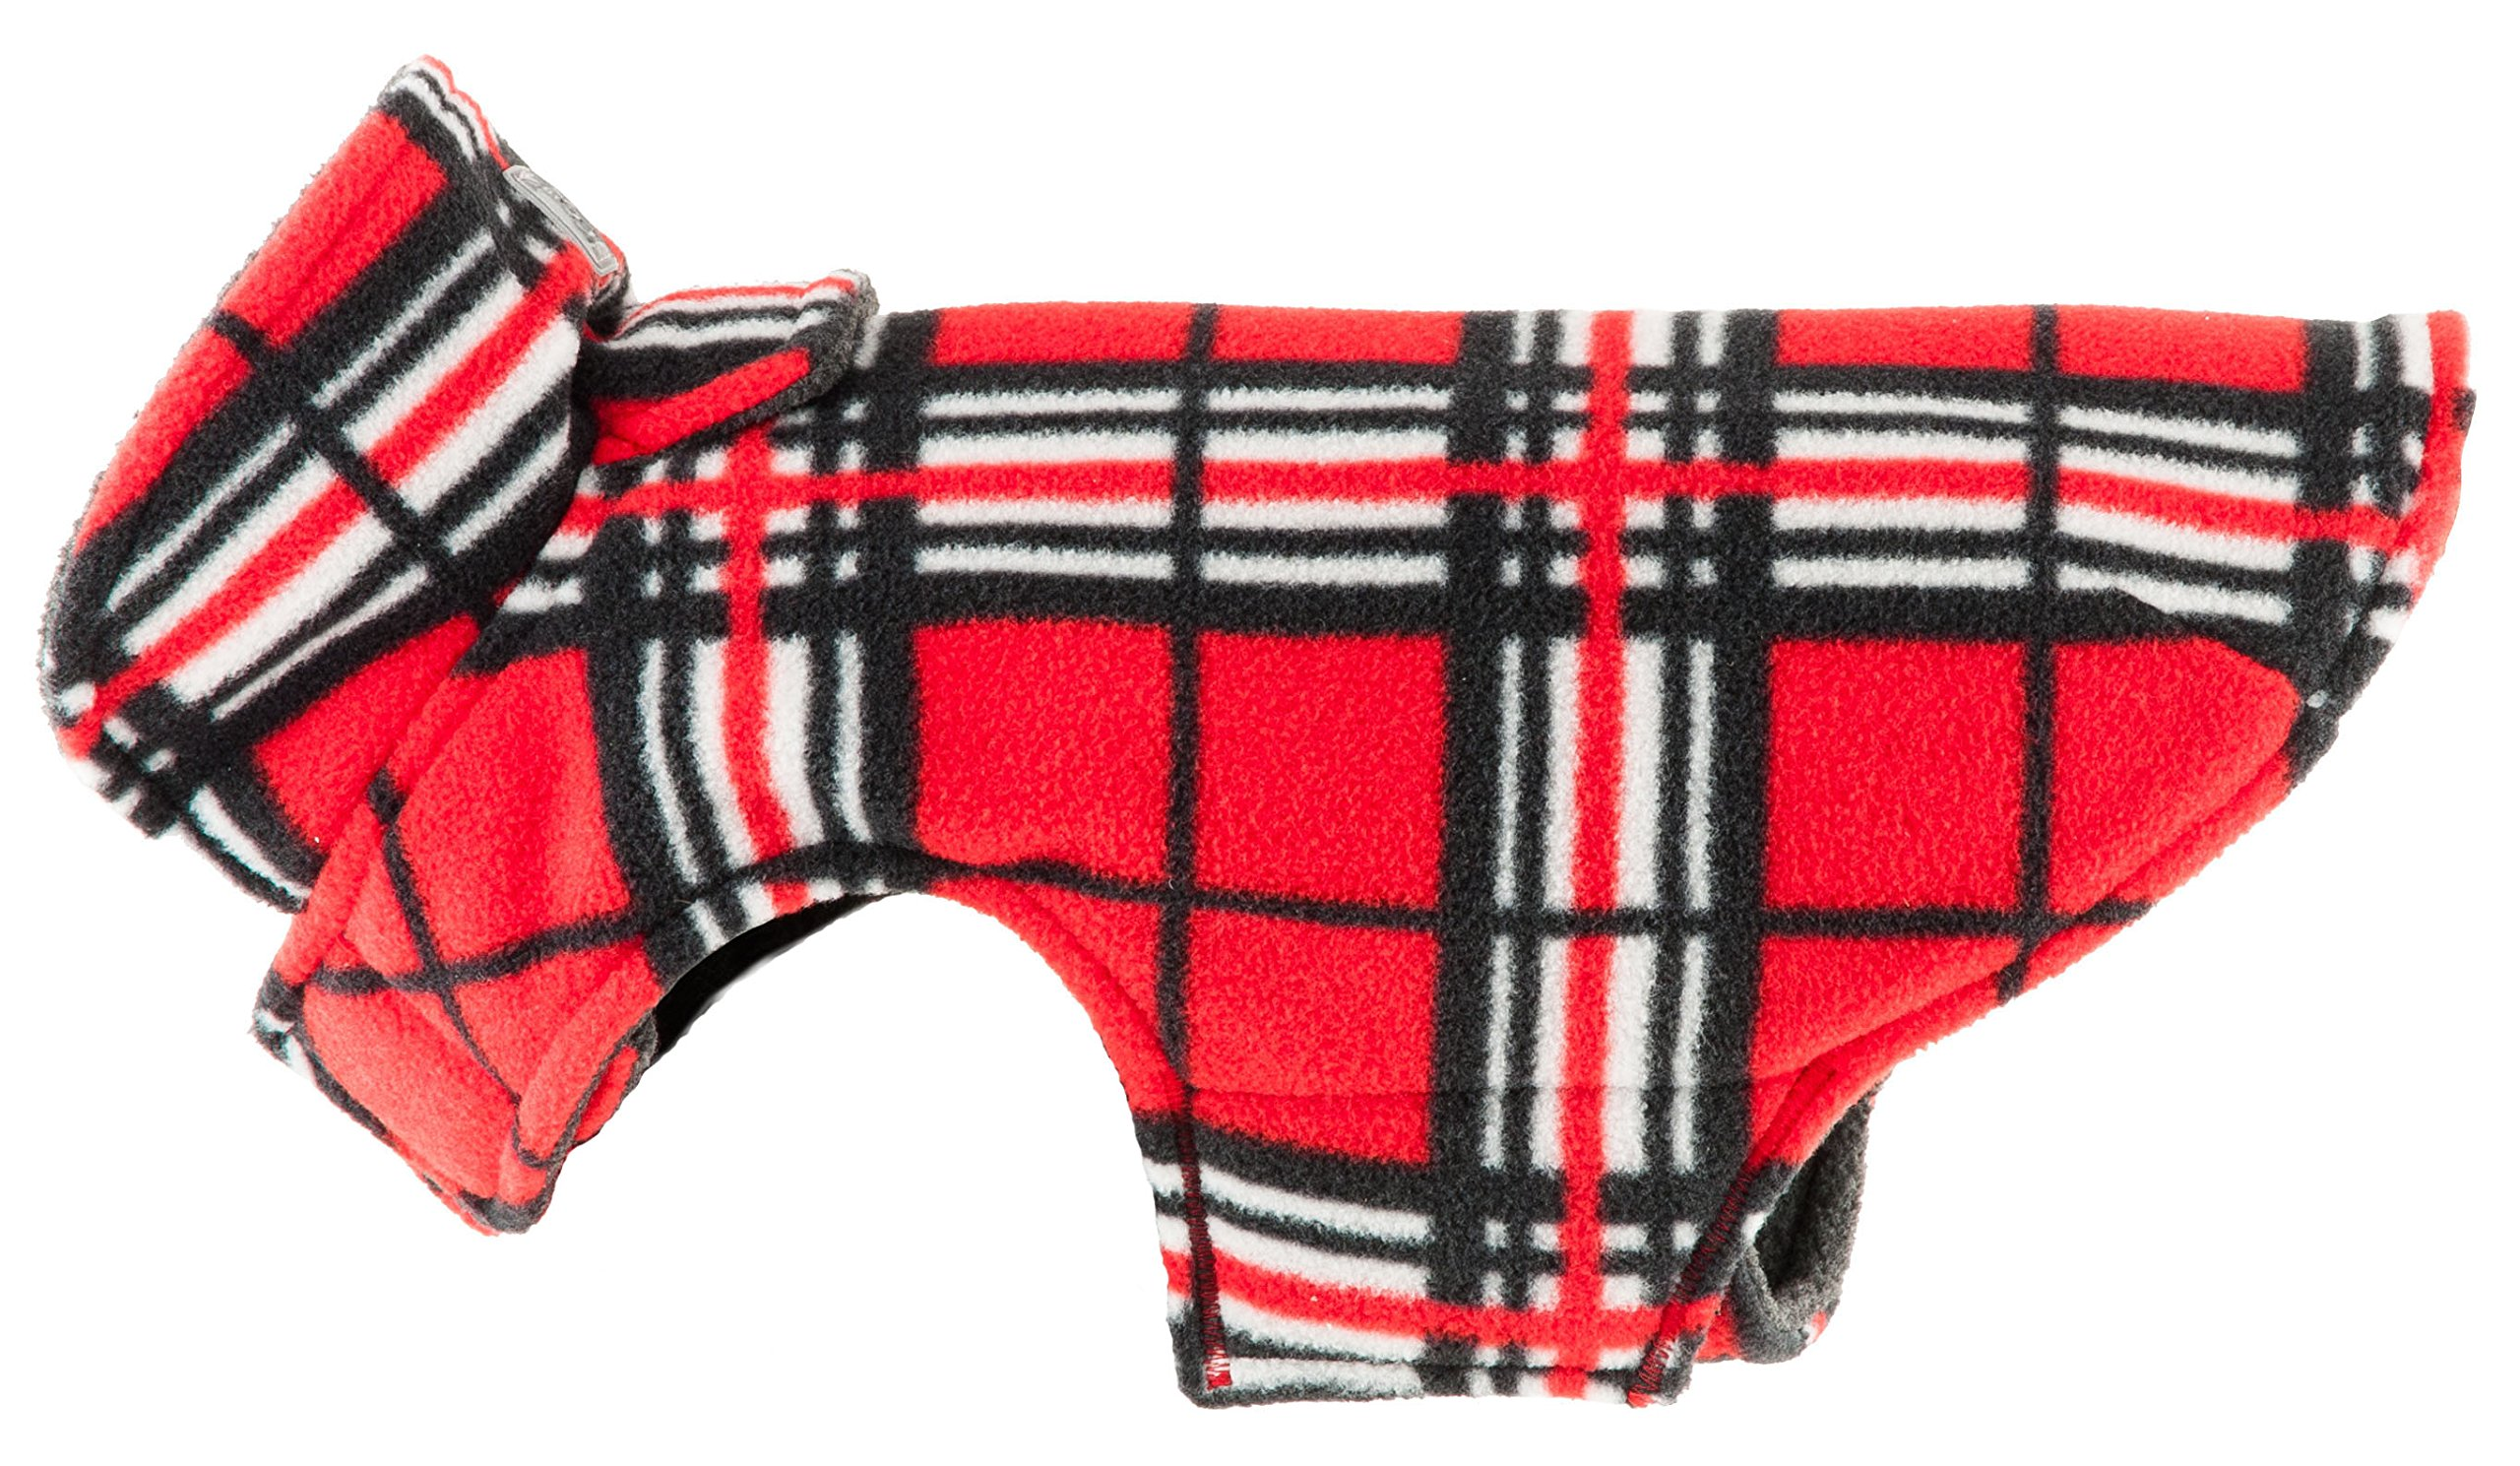 RC Pet Products Whistler Winter Wear V.2 Fleece Dog Coat, Size 22, Red Tartan